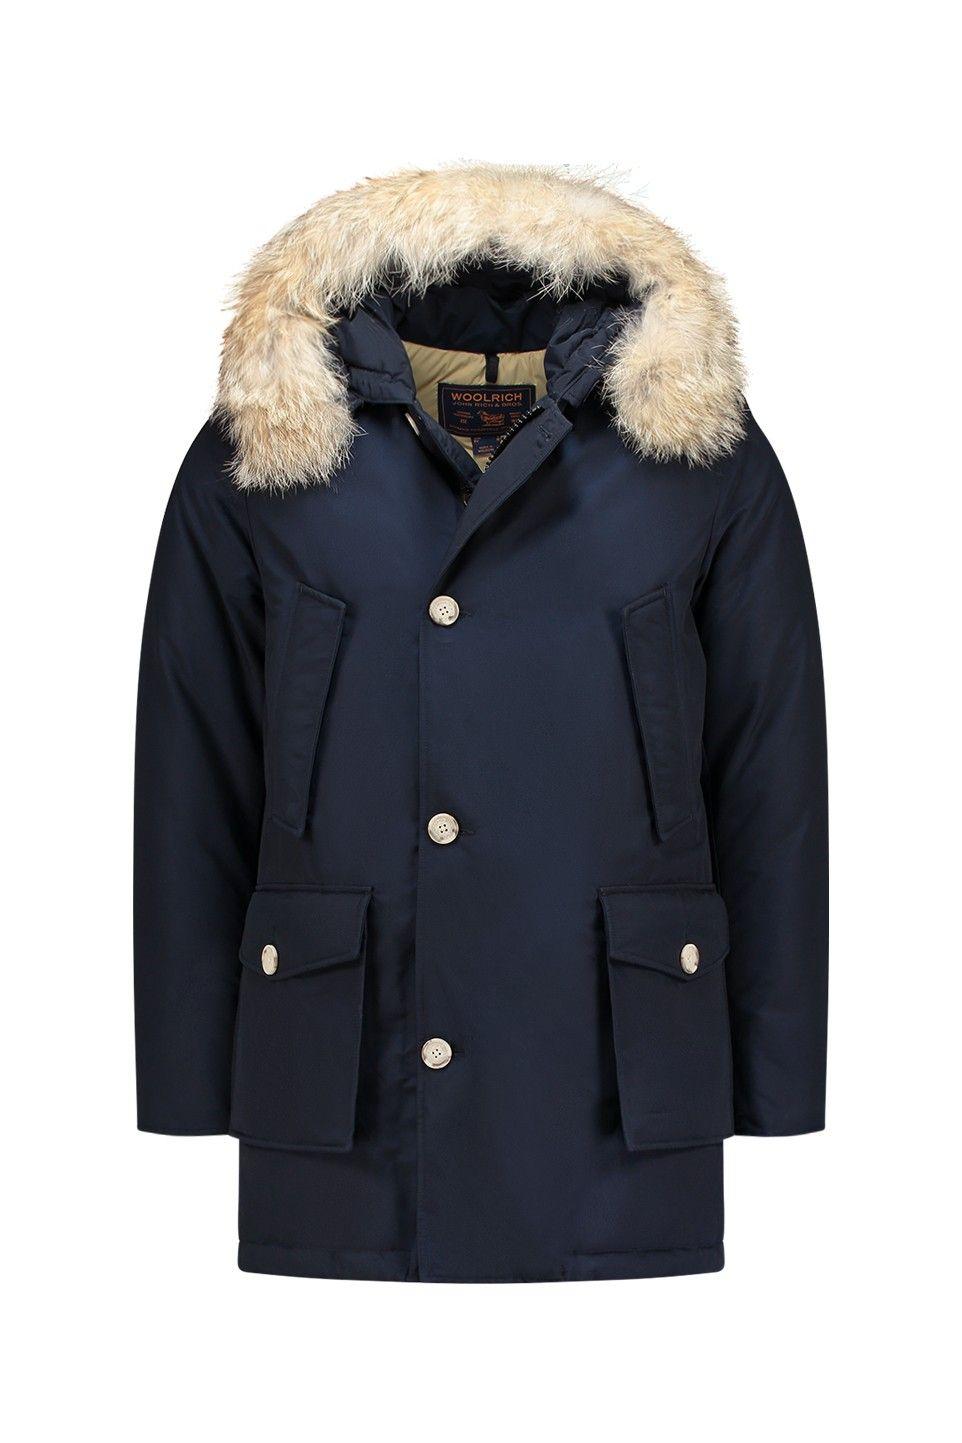 22e37378086549 Woolrich Arctic Parka DF Melton Blue - WOCPS1674 CN01 MLB - MERKEN Bloom  Fashion